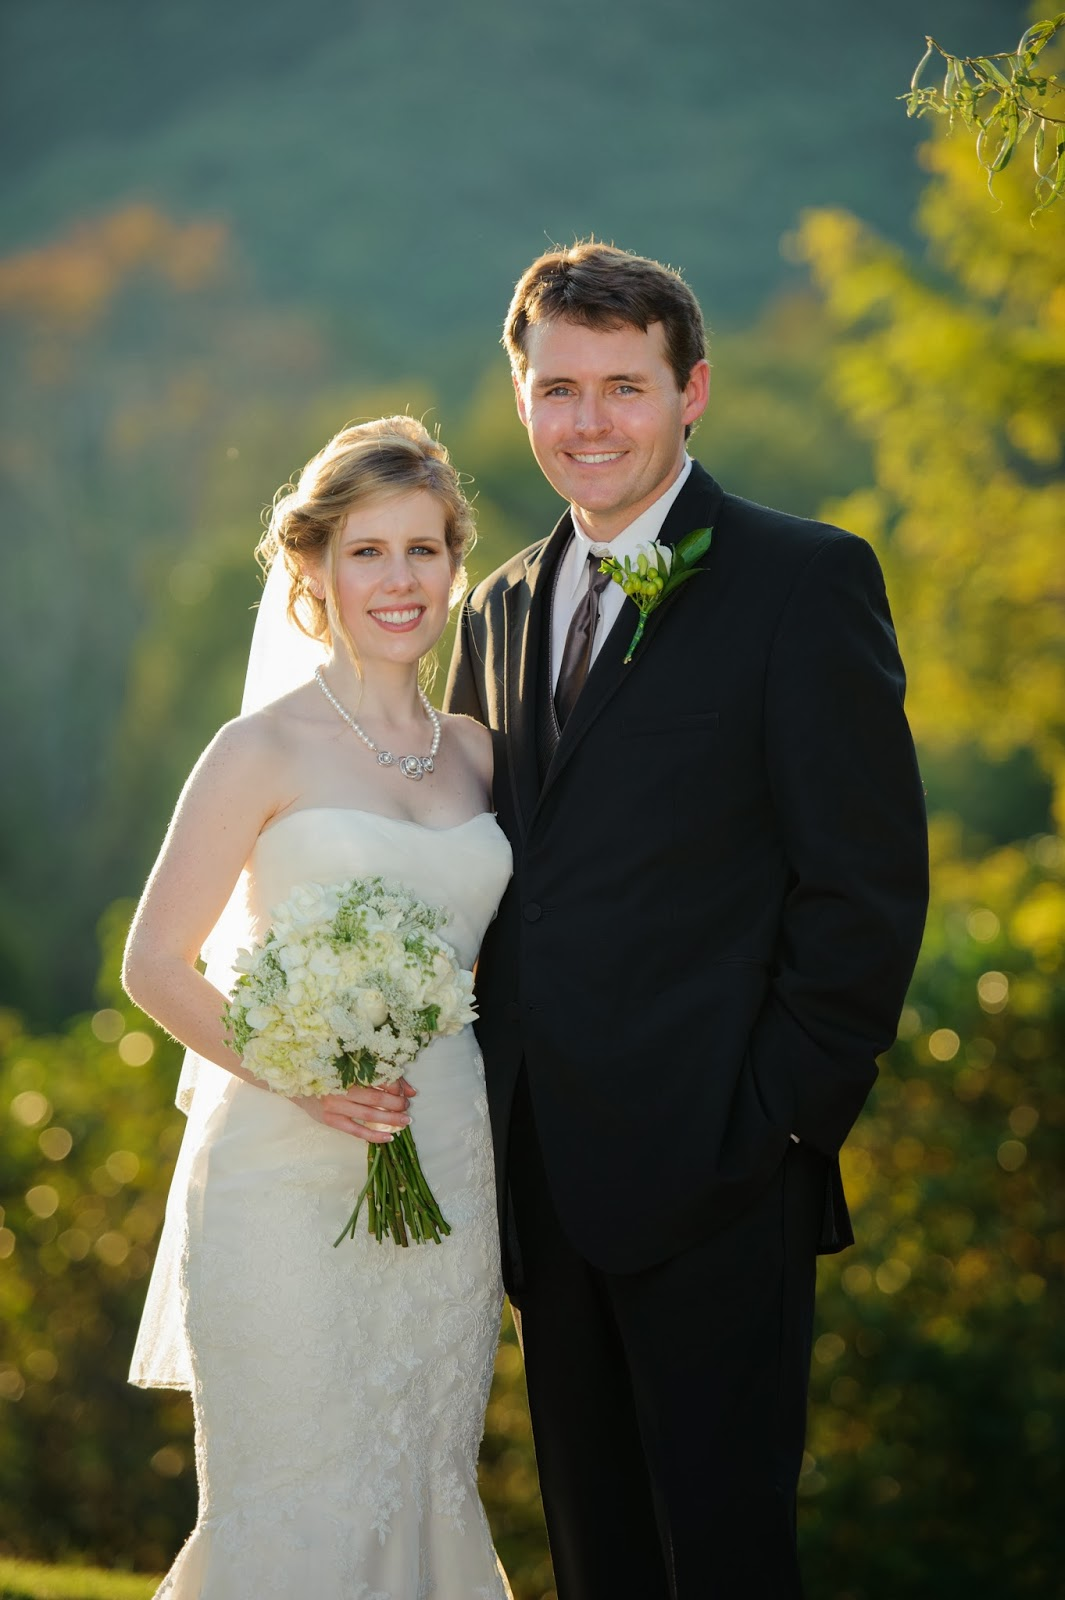 Shawn Johnson Wedding.Cable Photography Video Laura Renfro Shawn Wilson Wedding